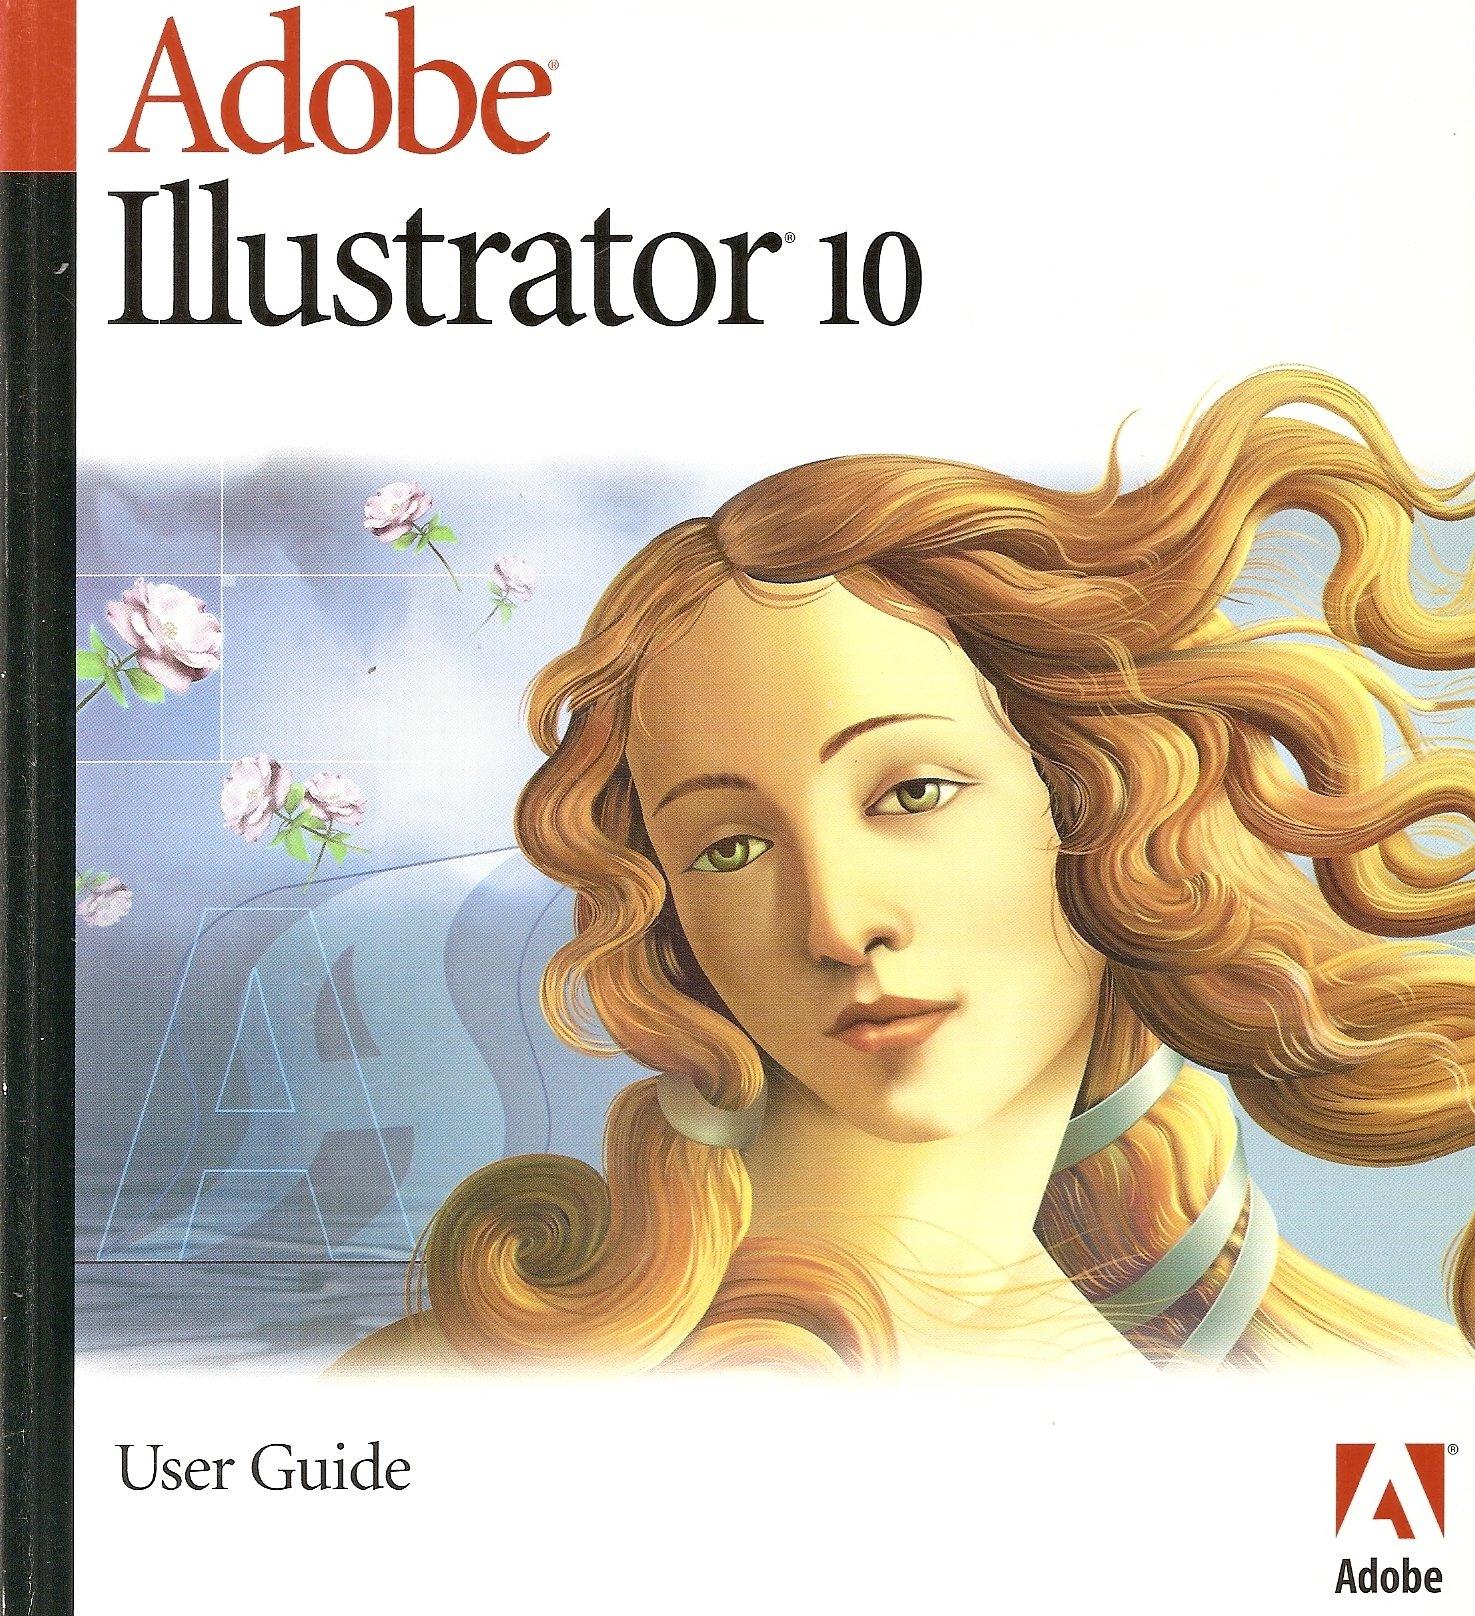 Adobe Illustrator 10 Users Guide